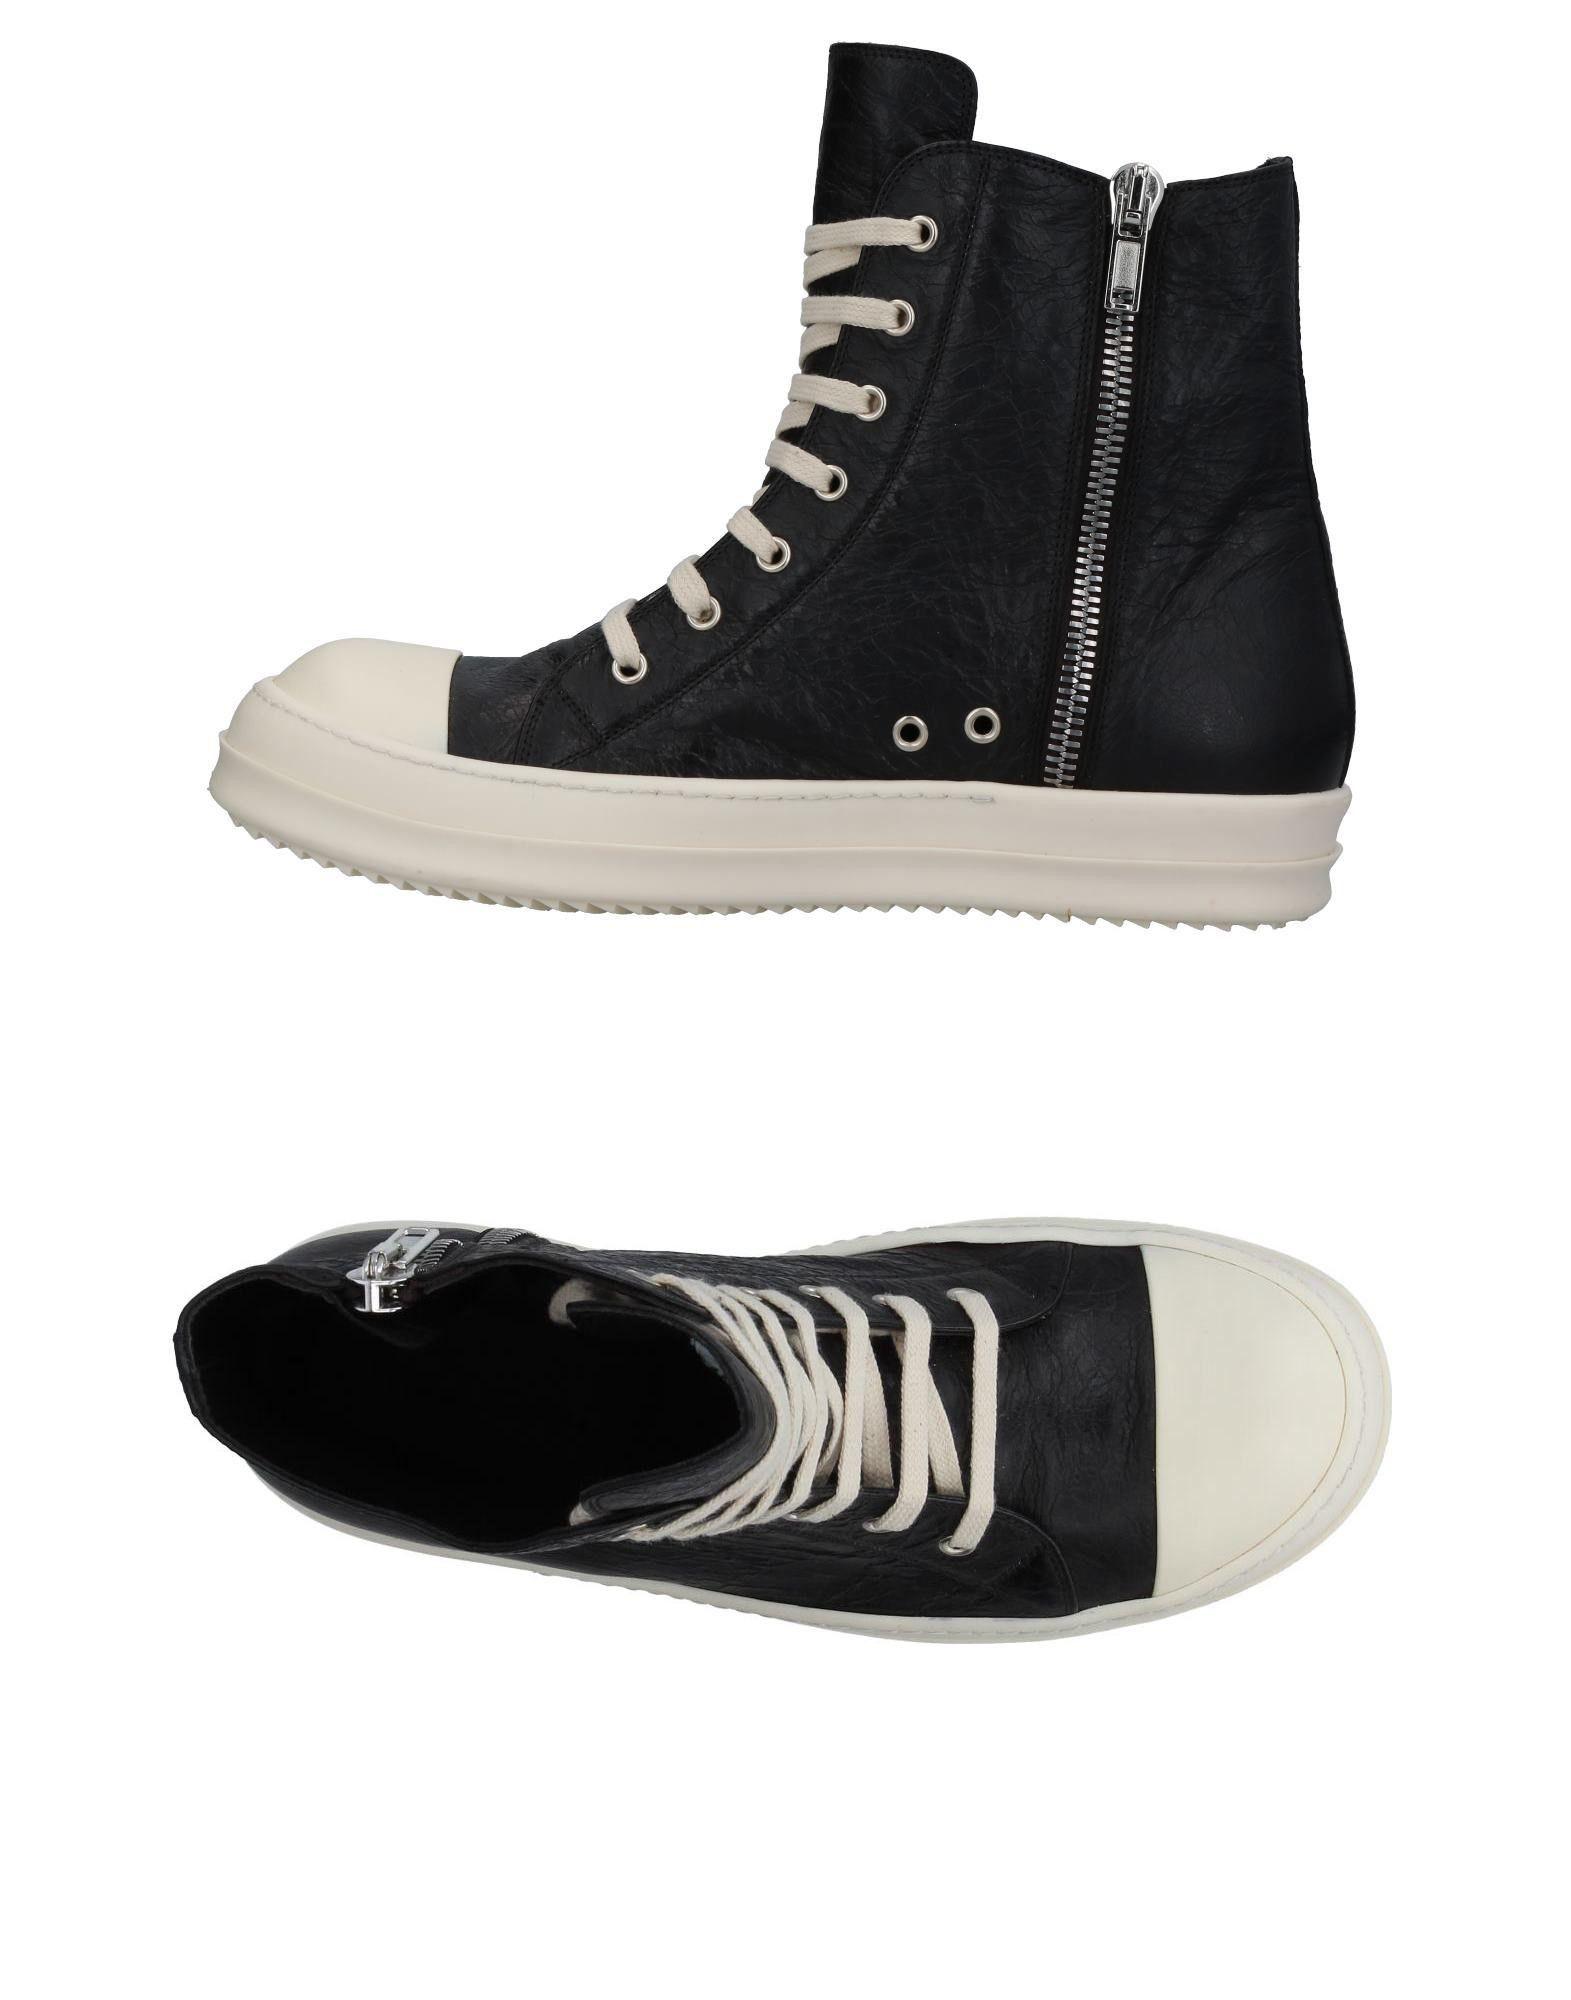 Rick Owens Sneakers Herren  11398582AM Gute Qualität beliebte Schuhe